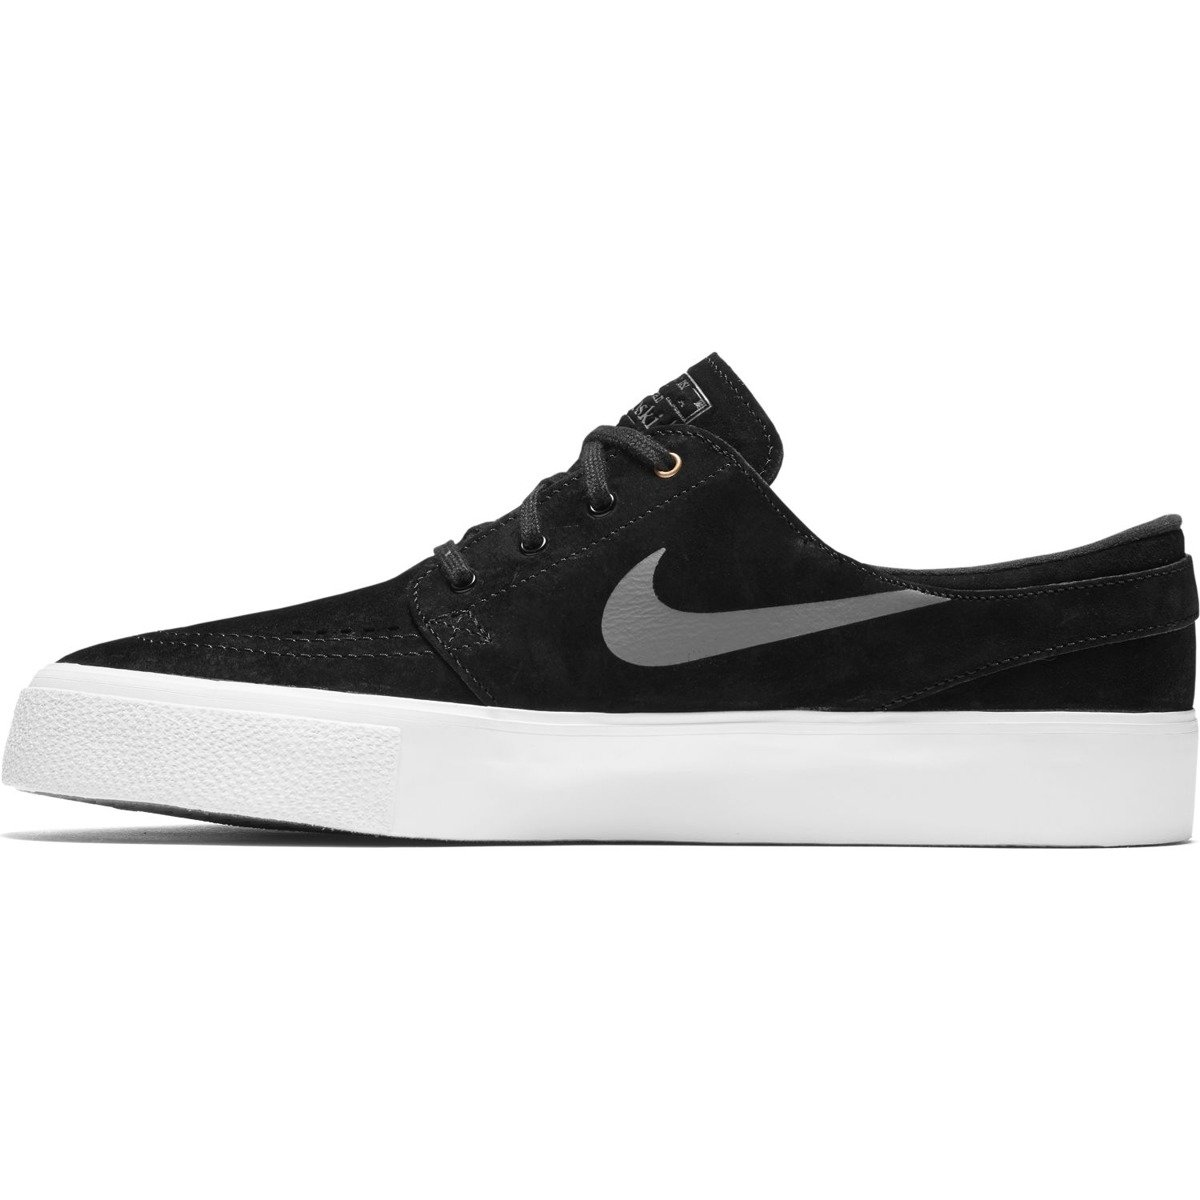 Miniramp Skateshop buty nike sb zoom stefan janoski ht black dark ... 5ee2d539f4426